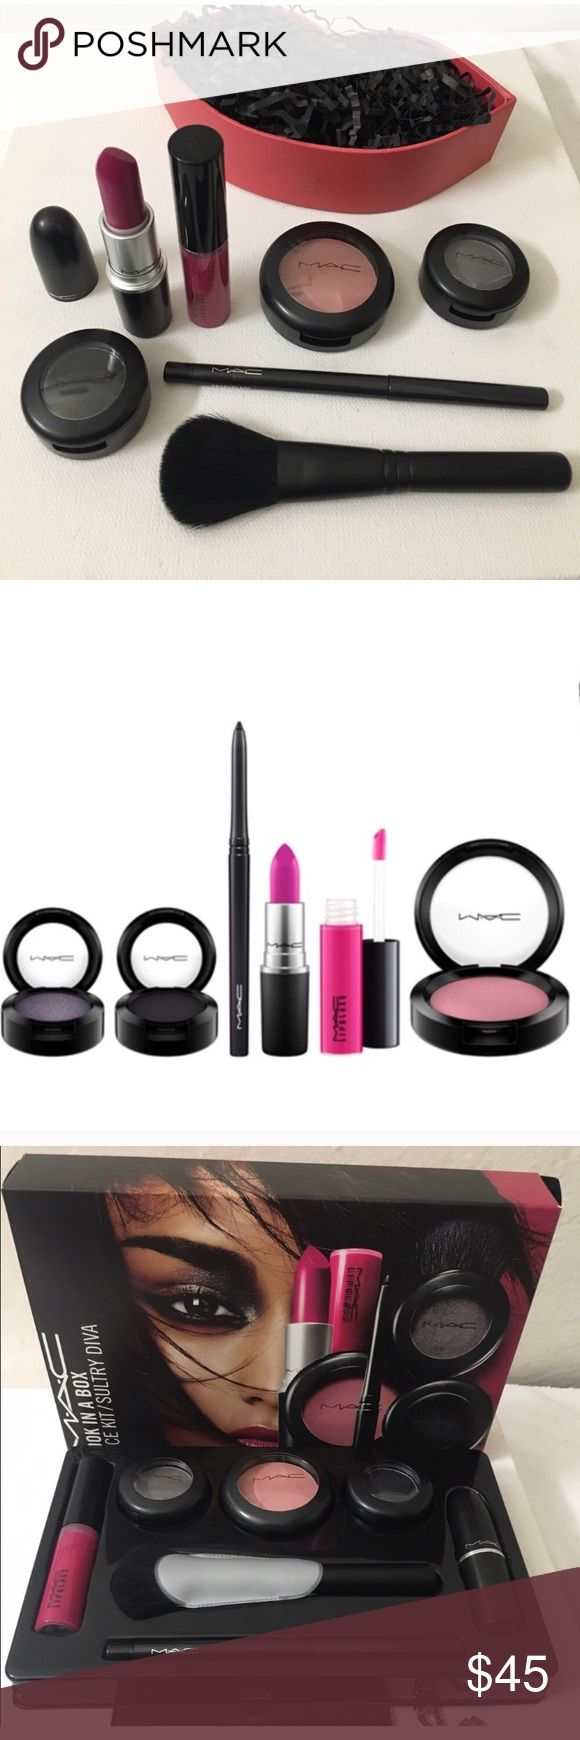 ✨💯Mac bundle x 4 ! Bnib flat fan lip , eyeshadow Get 4 brand new items ! Blush brush , blush in mocha , eyeshadow in pearled earth , and lipstick flat out fabulous ! New ! Get original box too MAC Cosmetics Makeup Blush